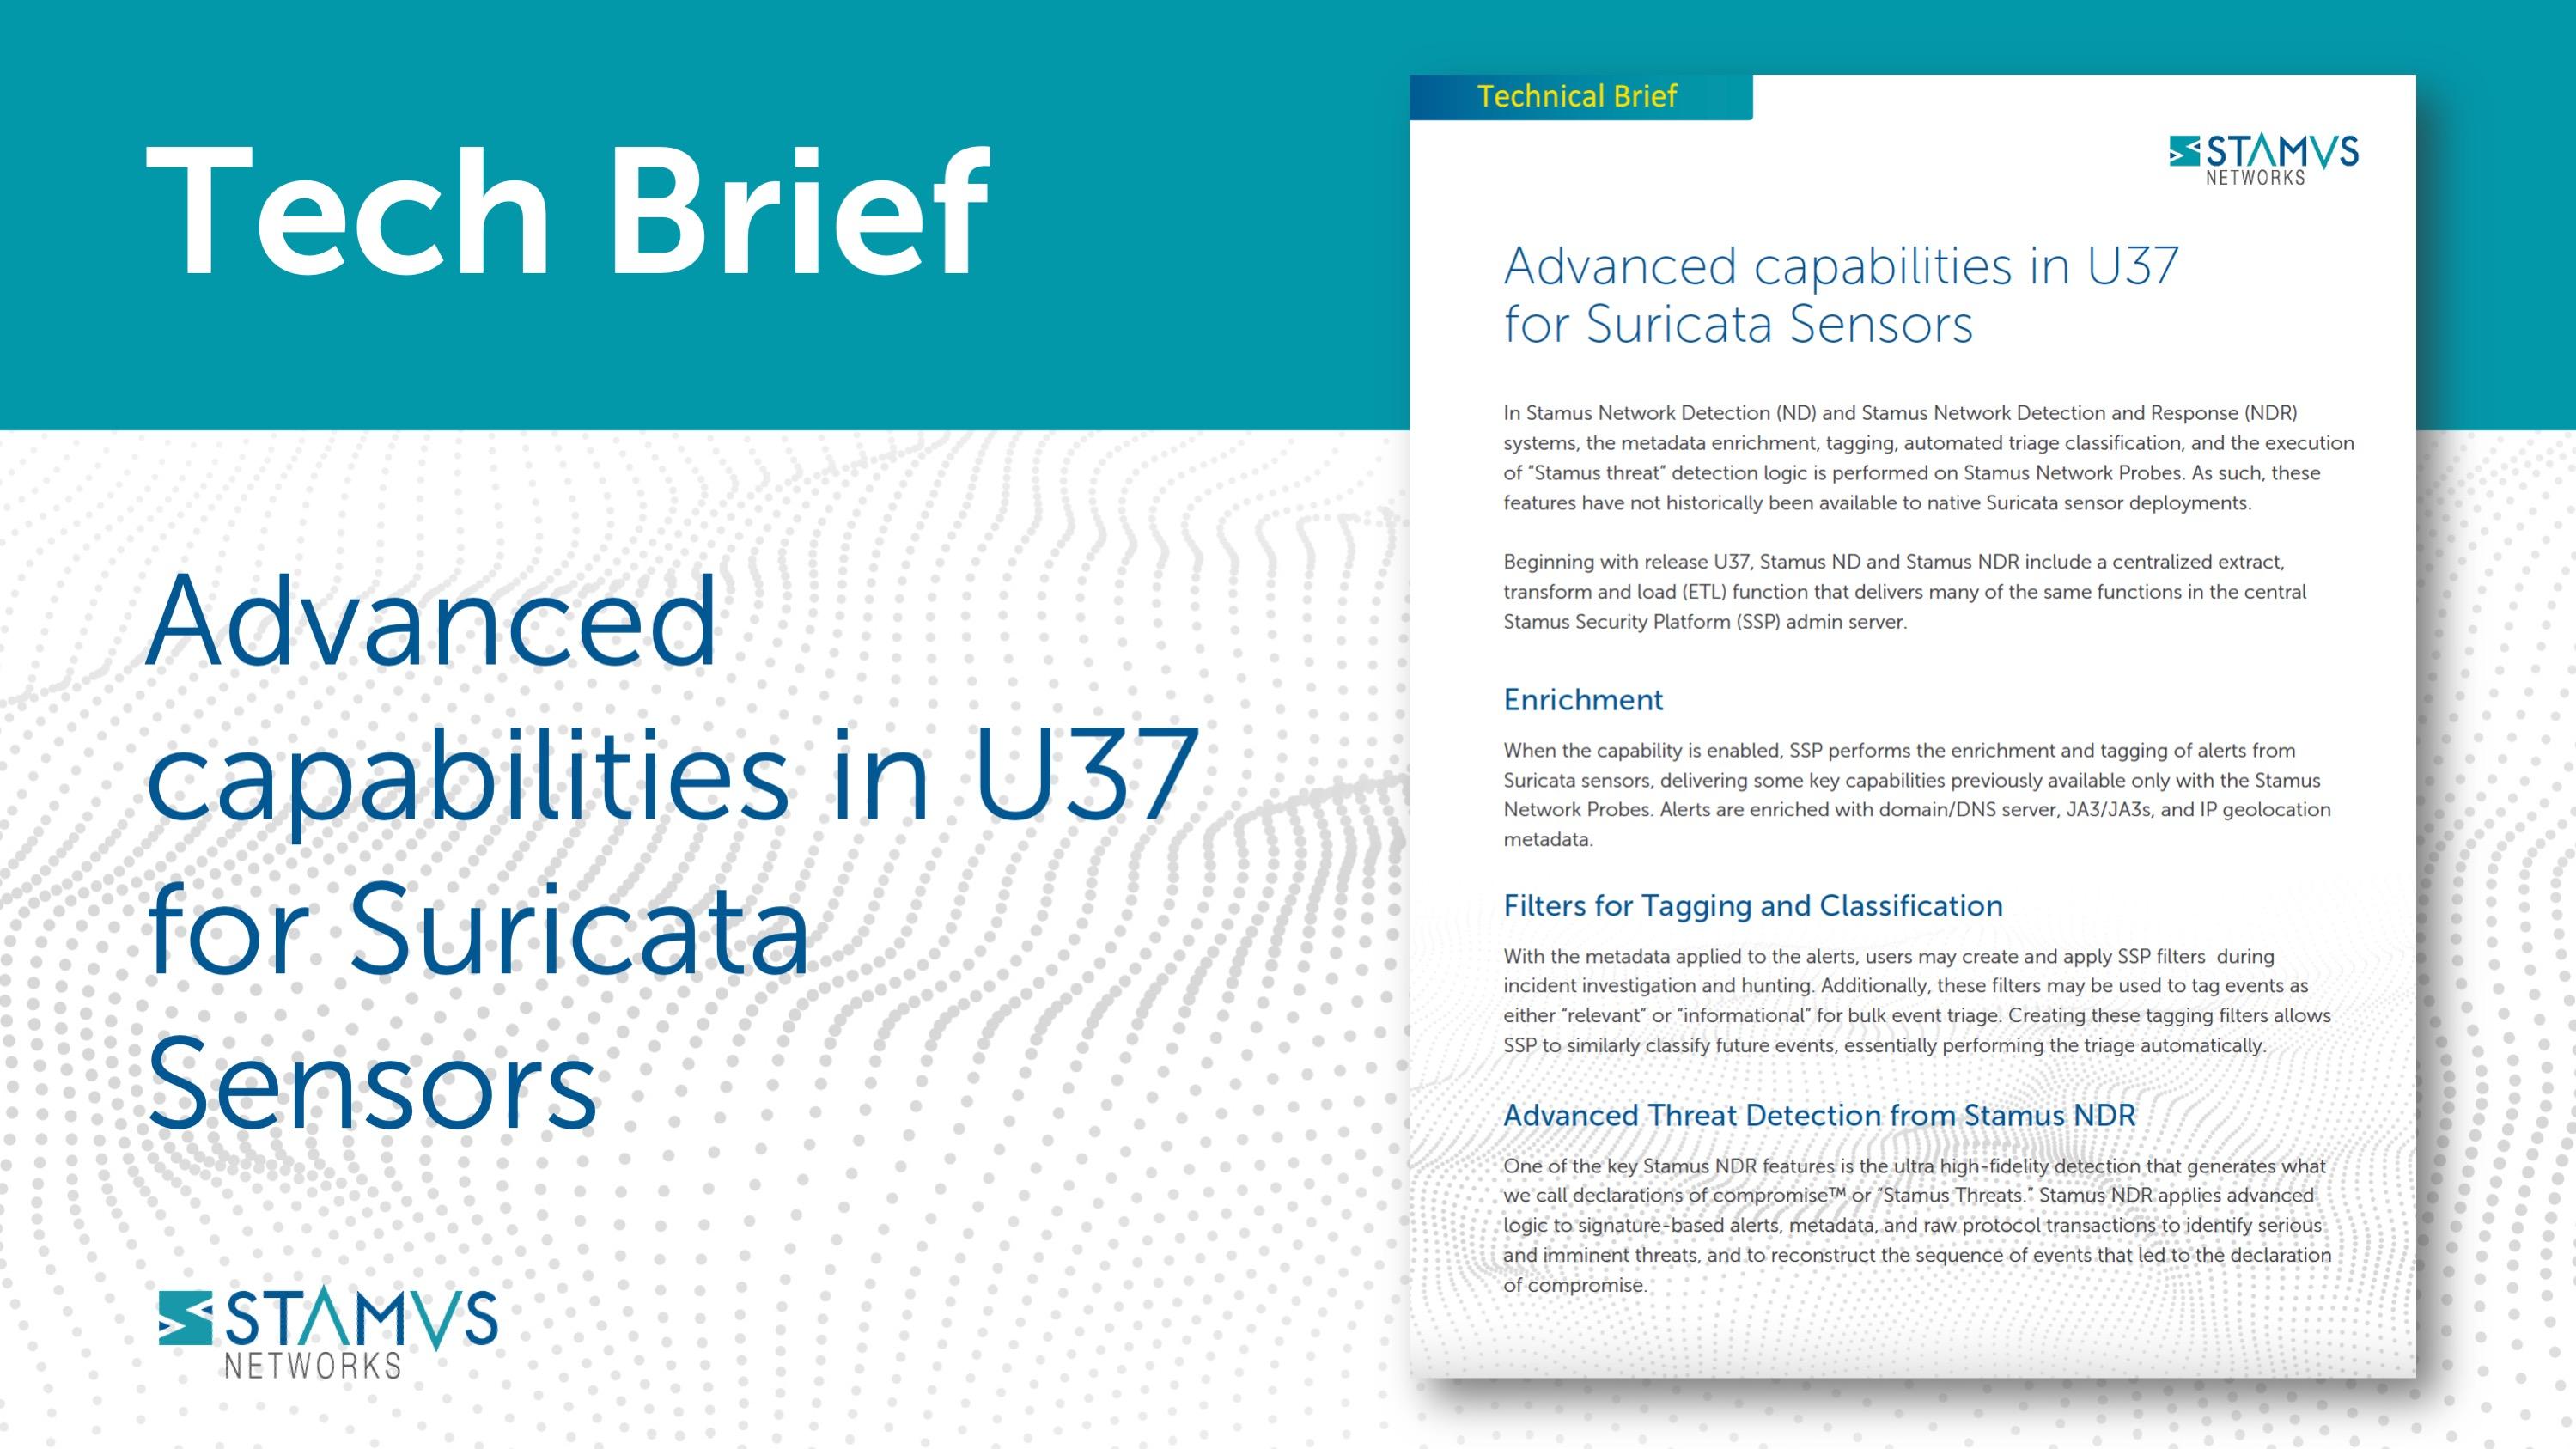 Advanced capabilities in U37 for Suricata Sensors